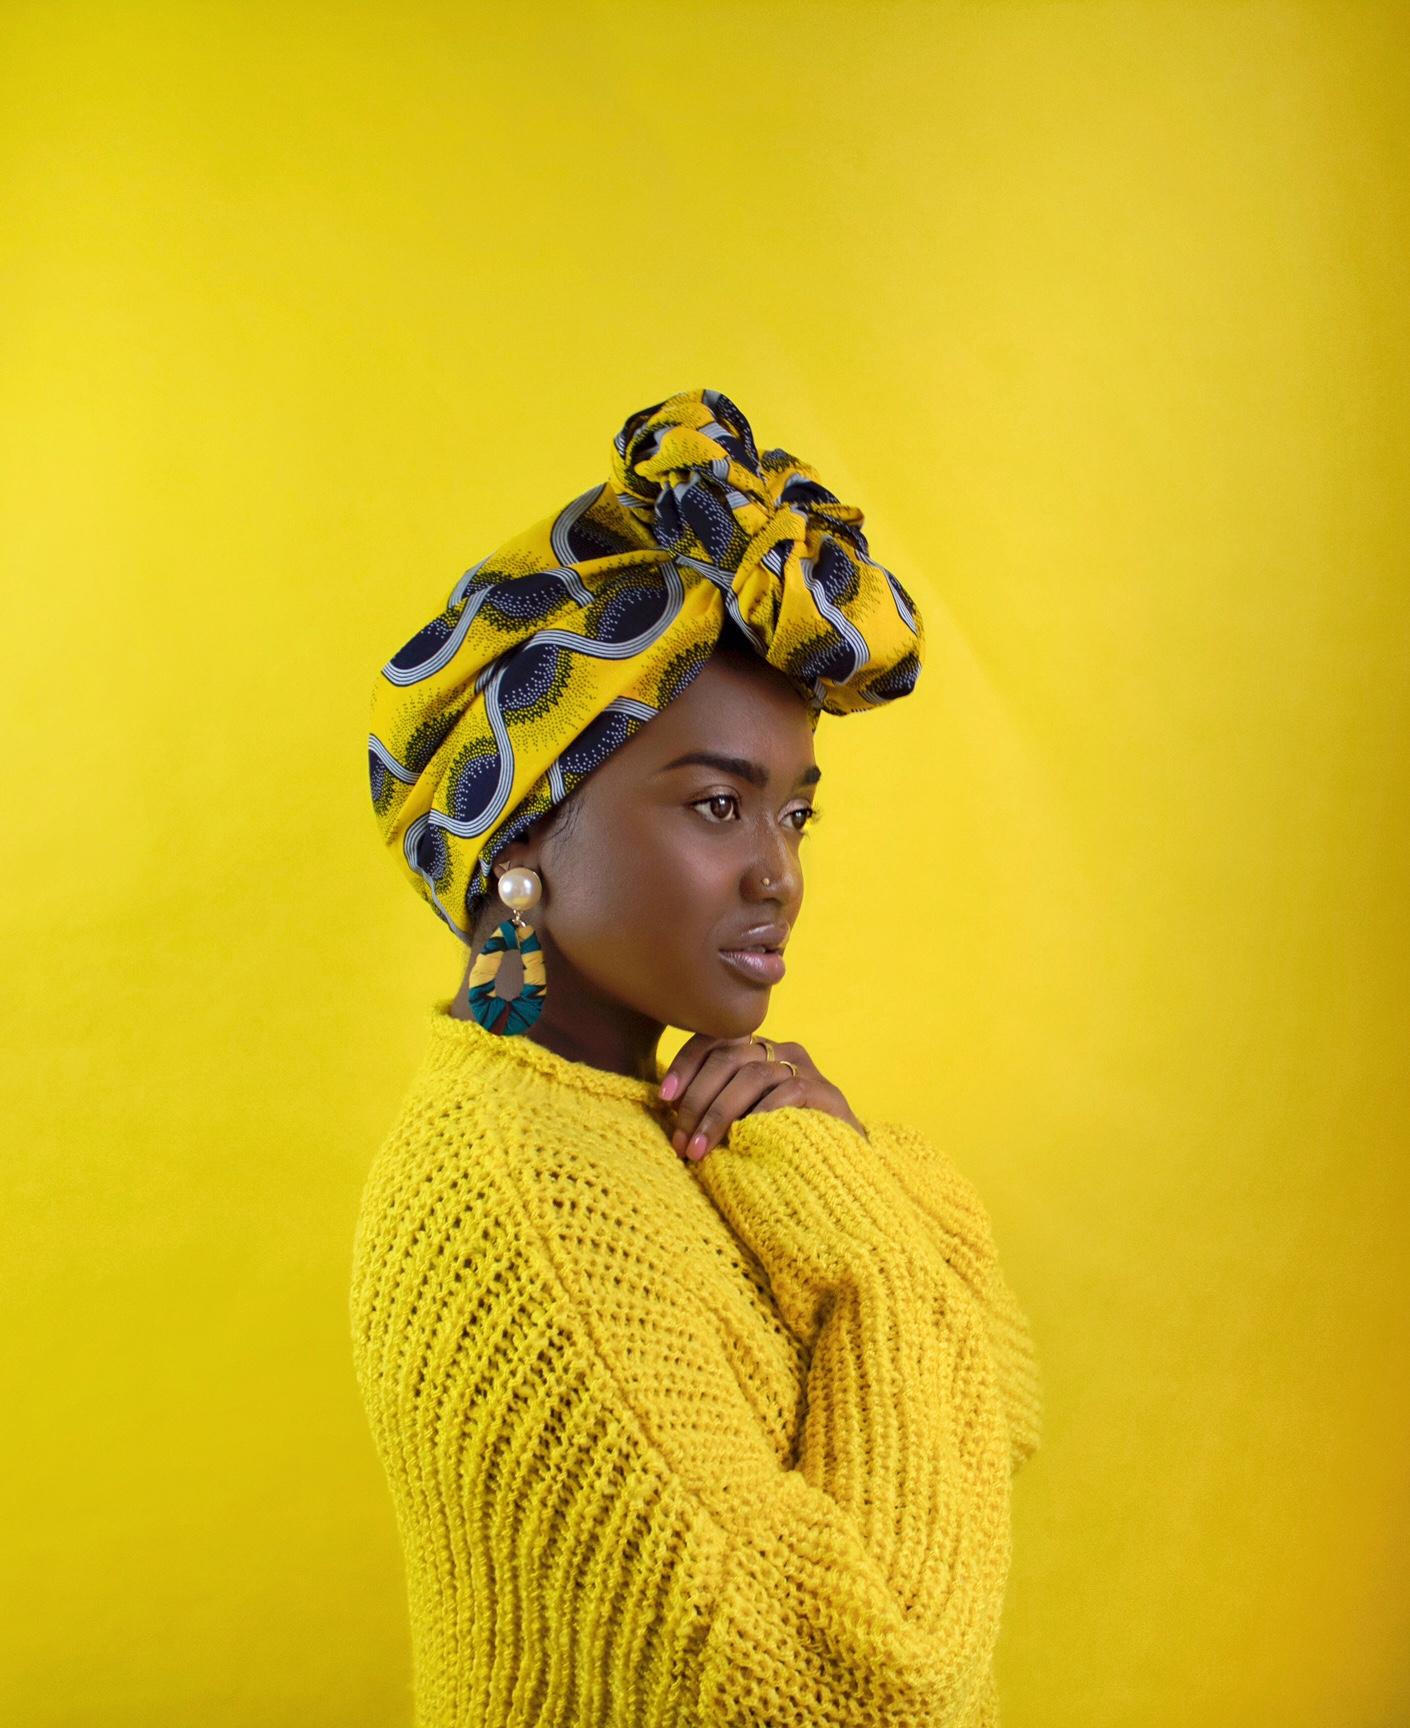 Shopfe-line Headwraps on Black BeauTEA Talk